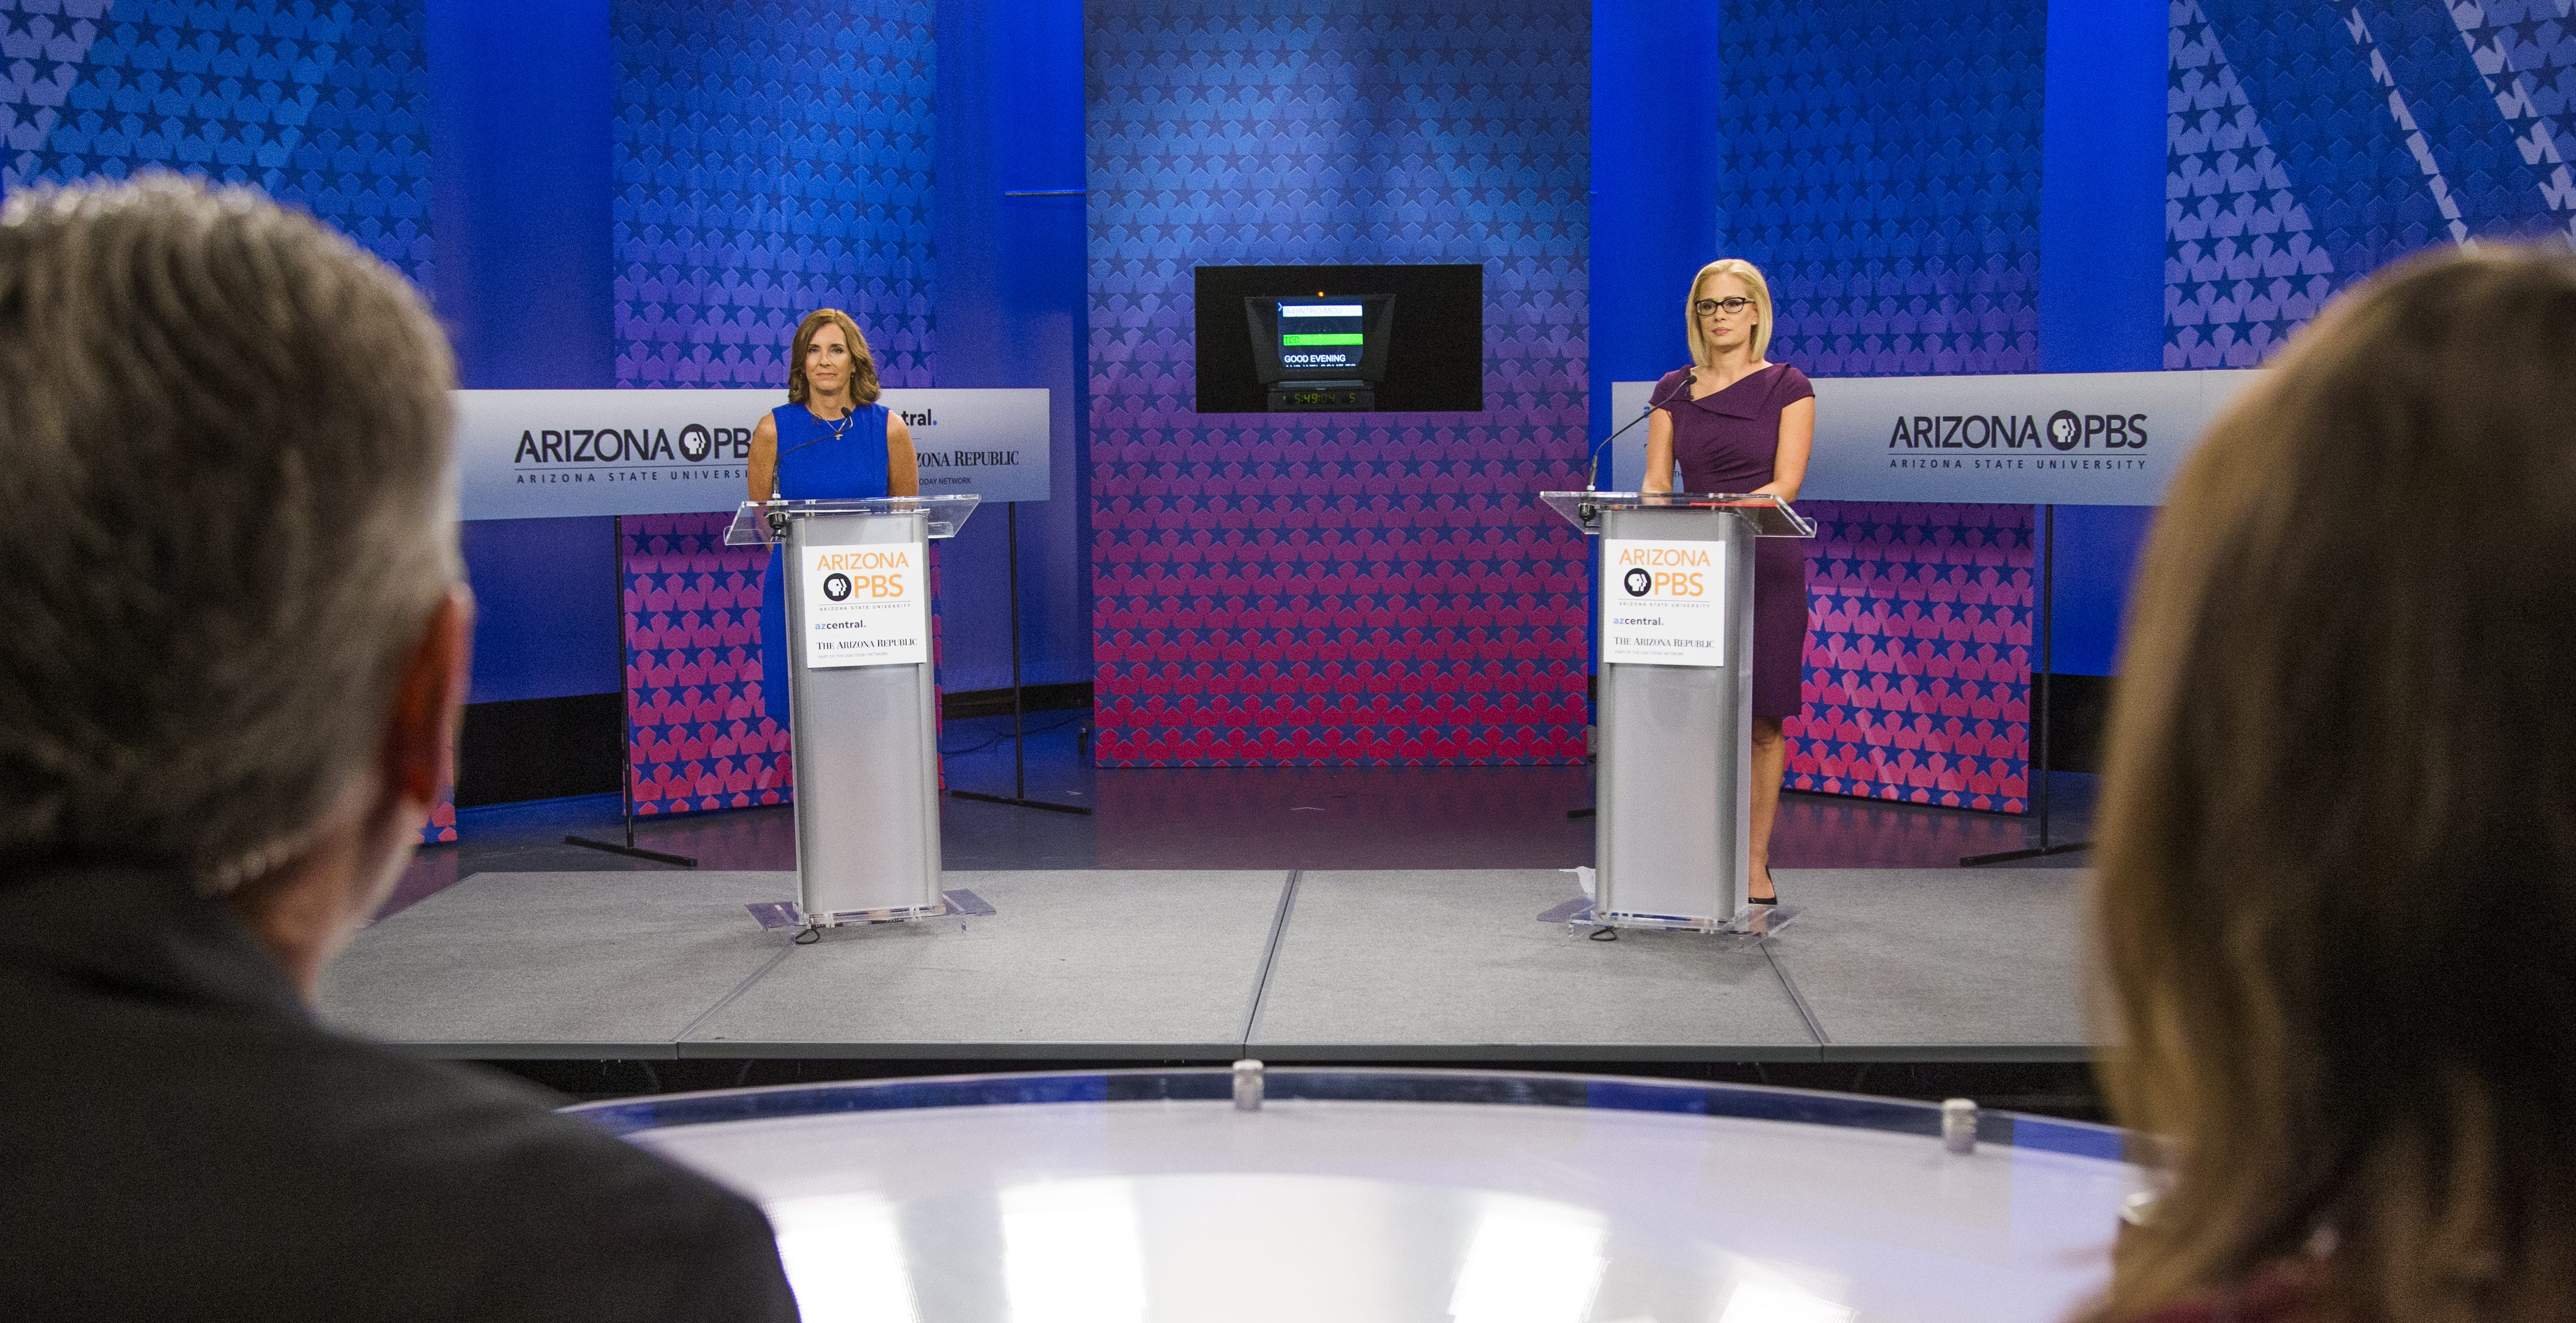 Debate expert breaks down body language, tone and tension during McSally-Sinema debate | Arizona Central